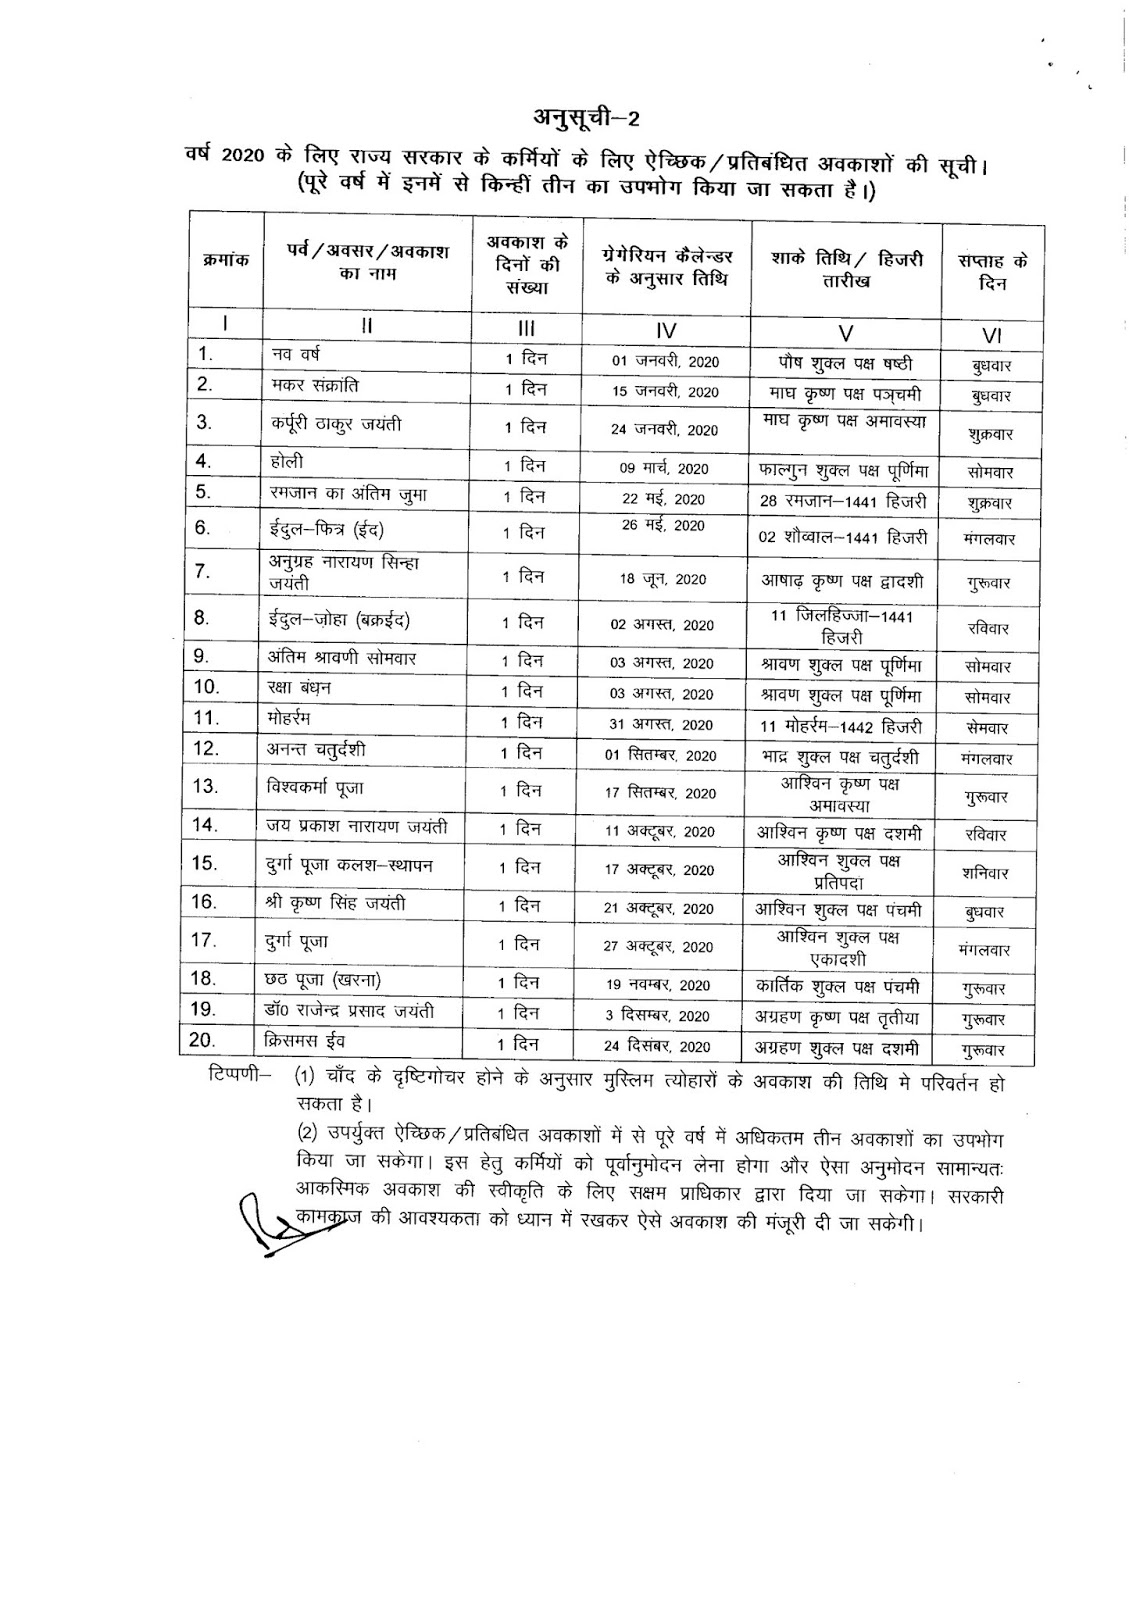 Bihar Government Calendar 2020 #educratsweb within Bihar Govt Official Calendar 2020